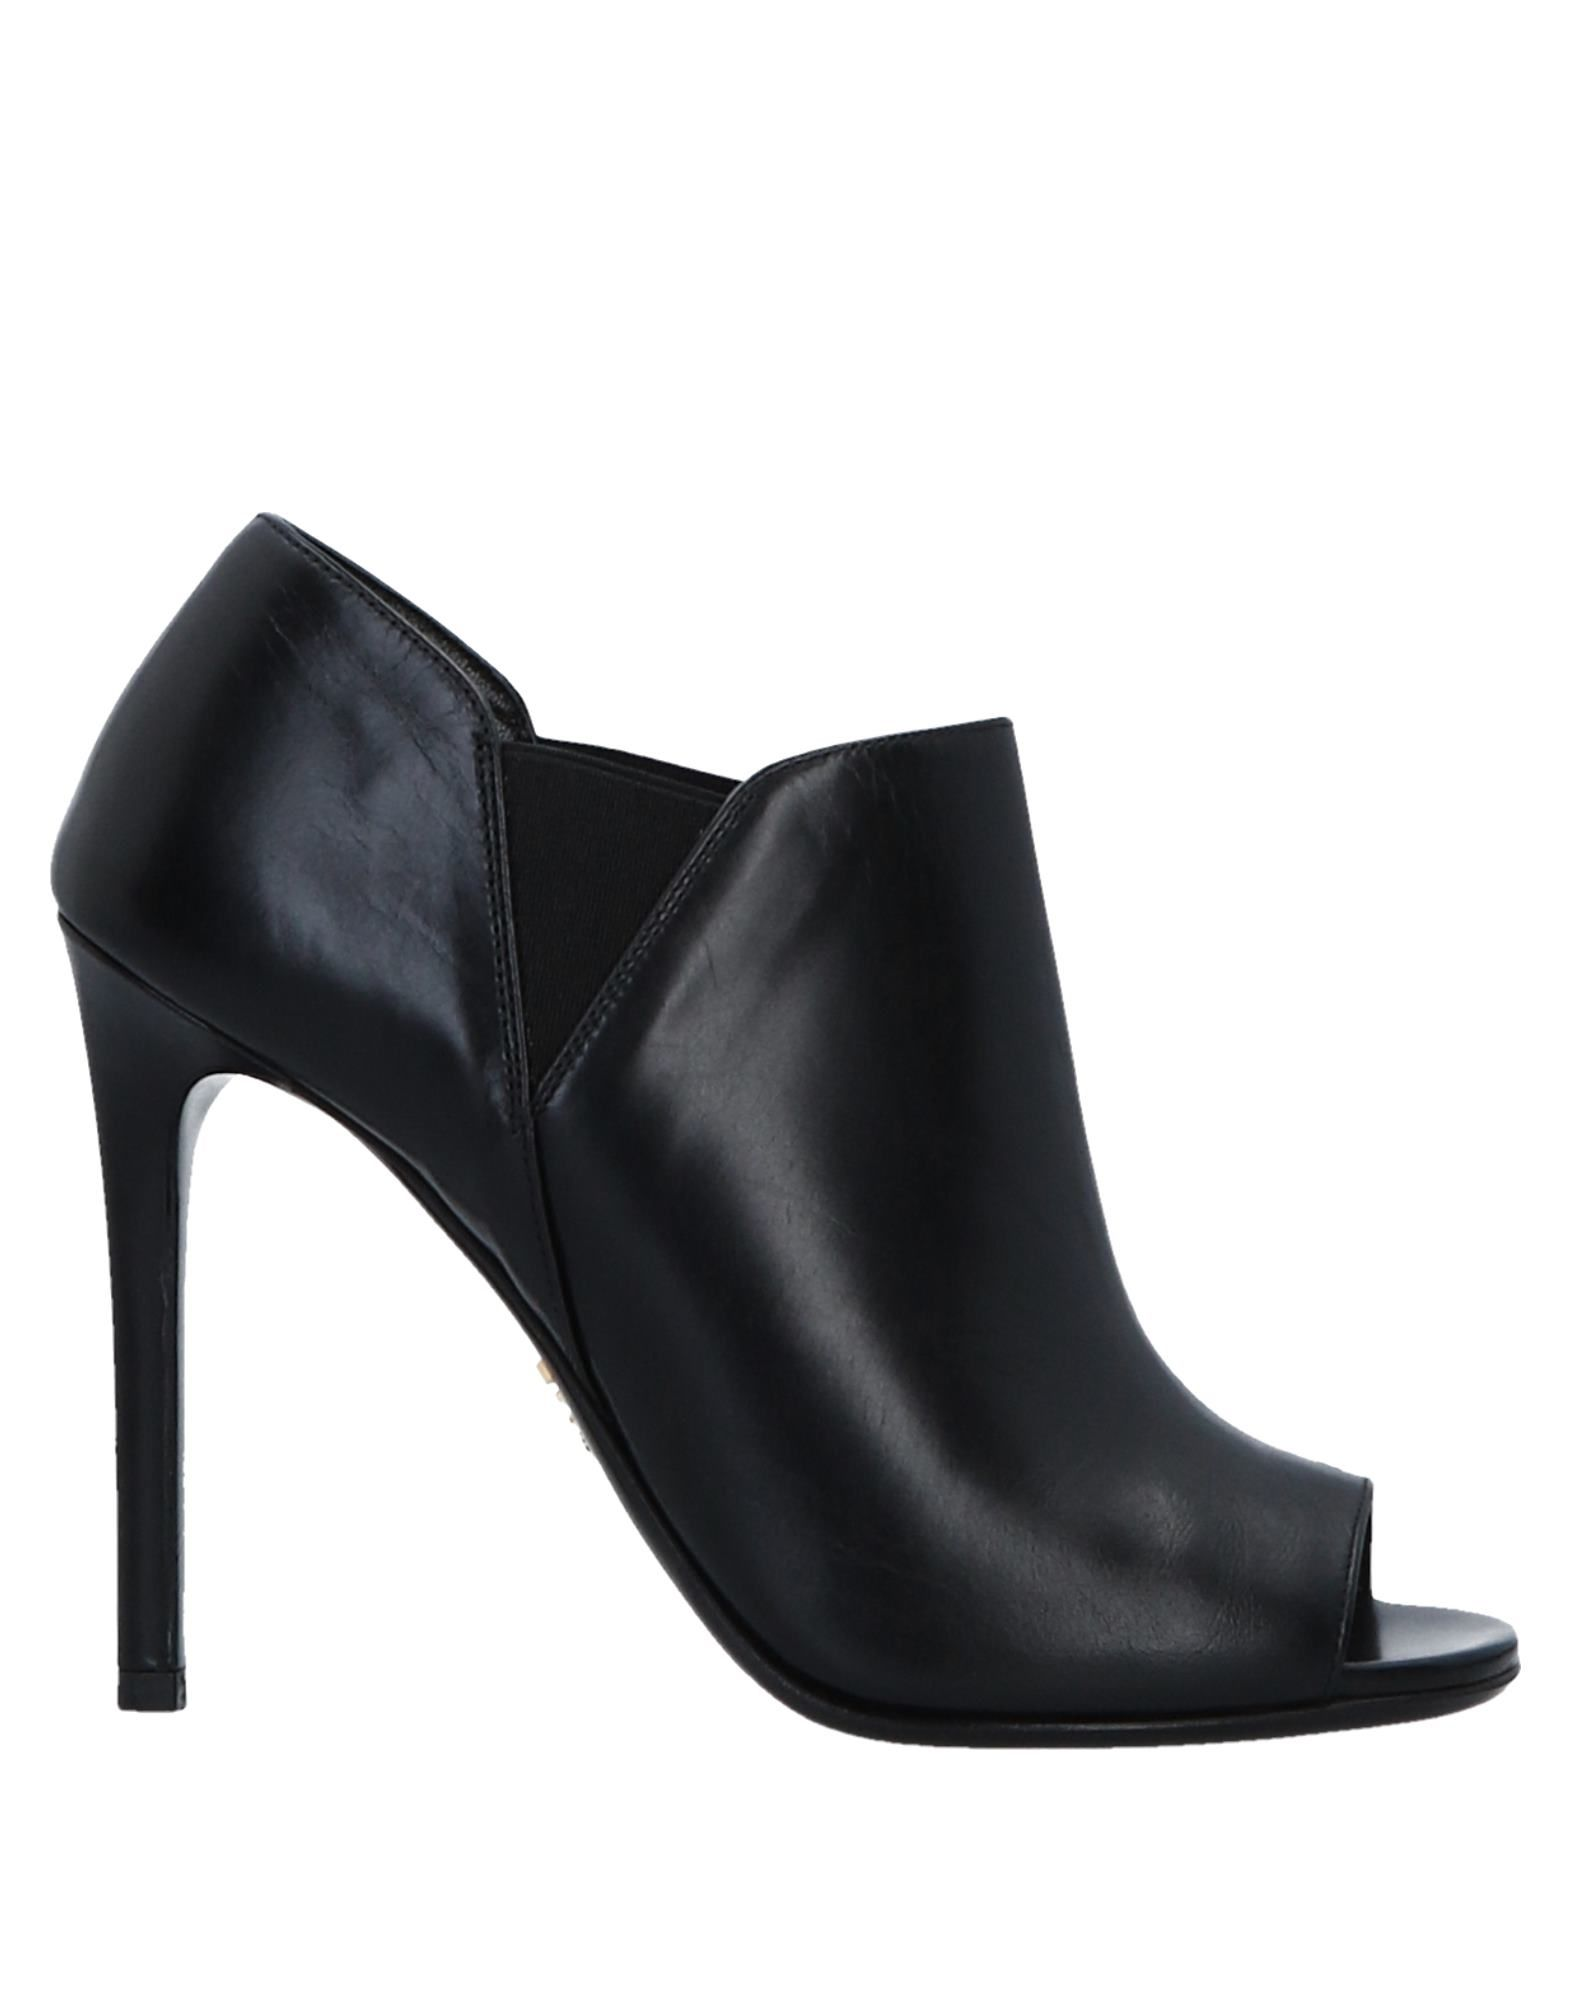 Rabatt Schuhe 11516778JC Prada Stiefelette Damen  11516778JC Schuhe 88974a